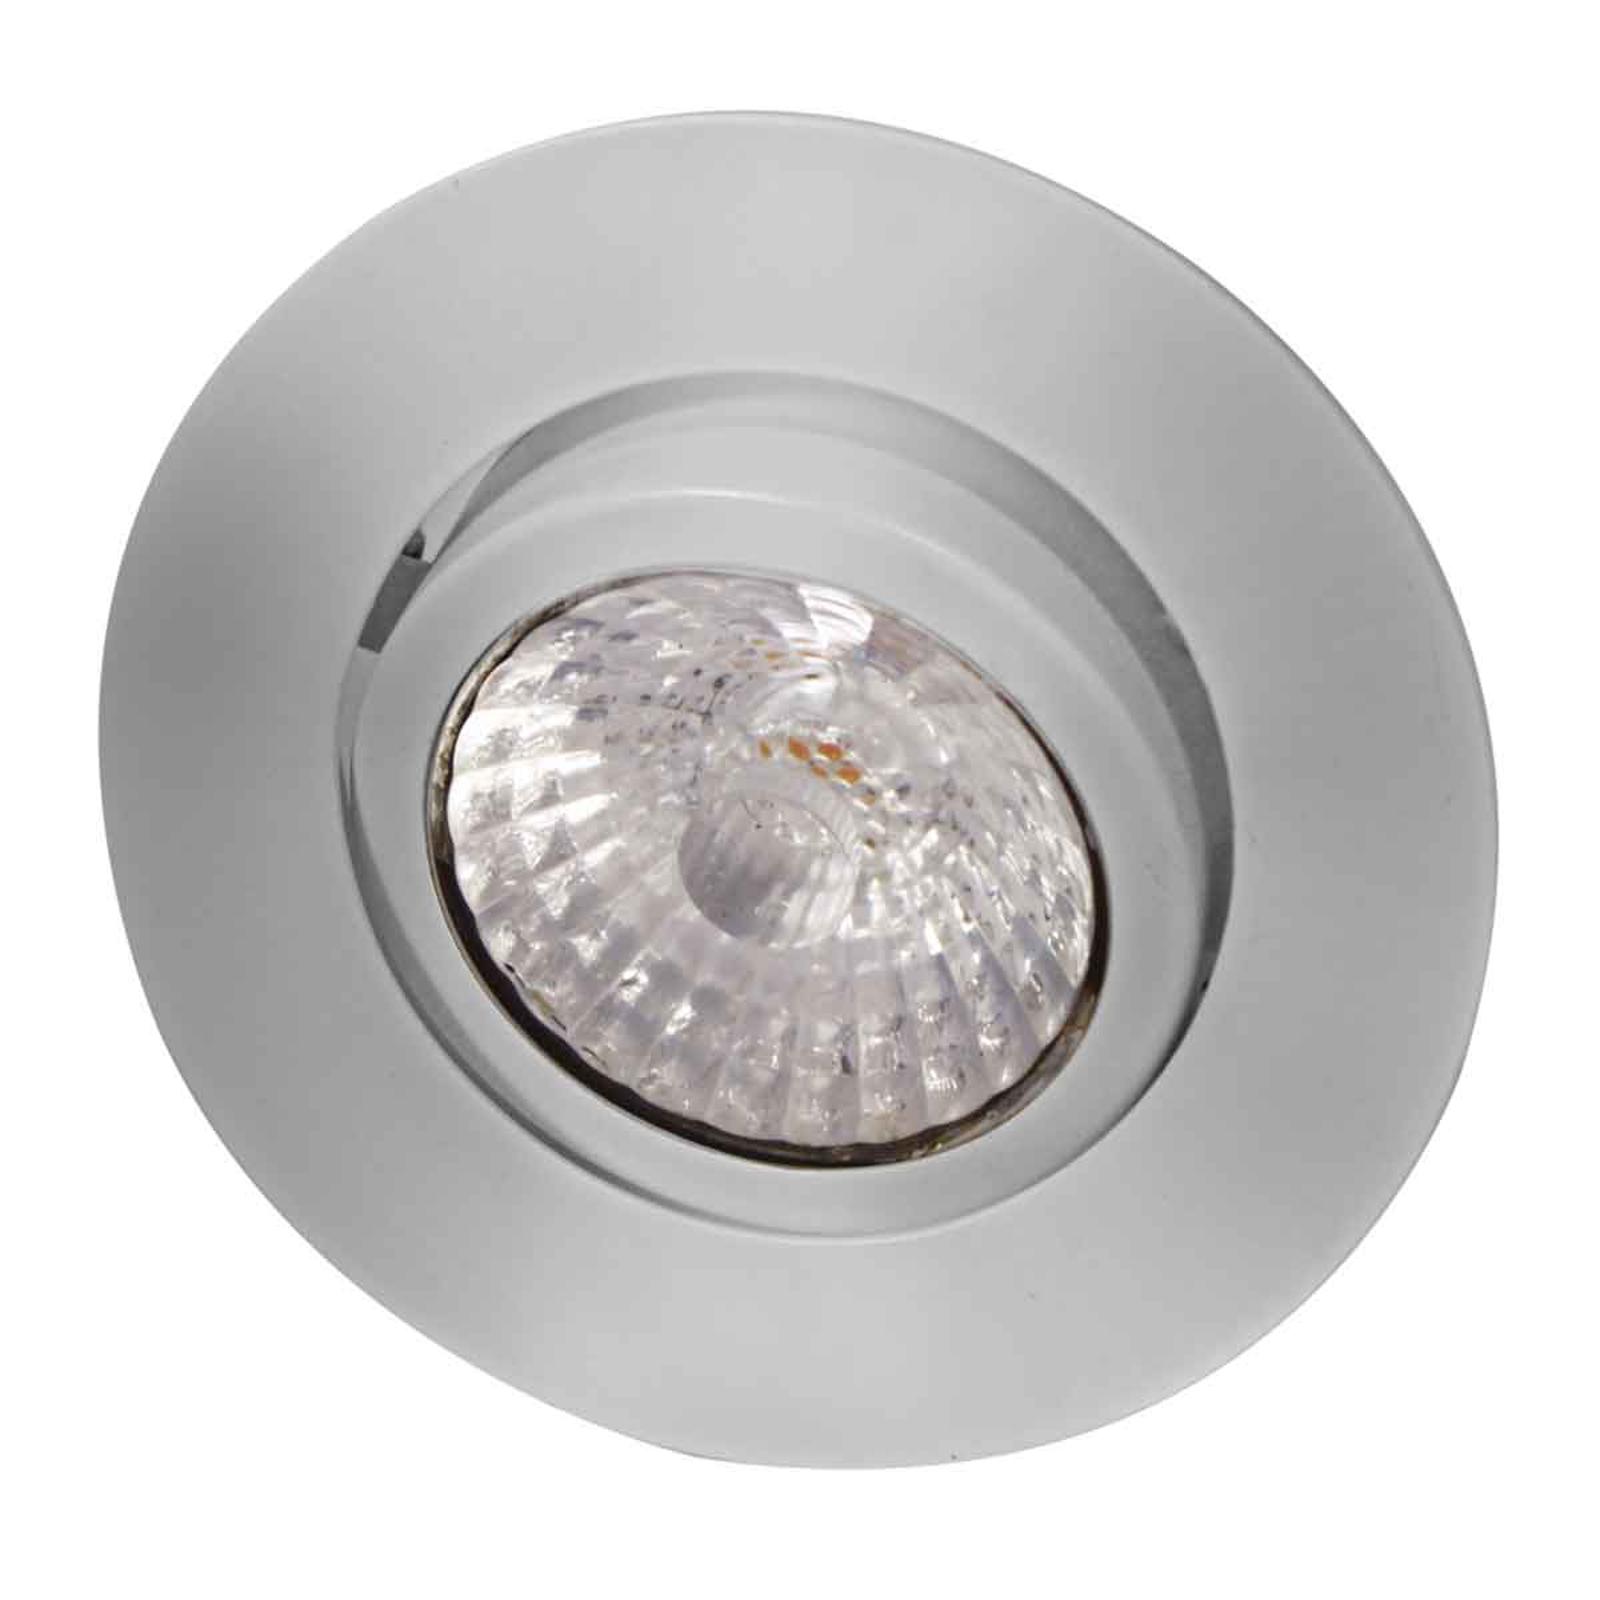 LED indbygningsspot Rico, dim to warm, stål